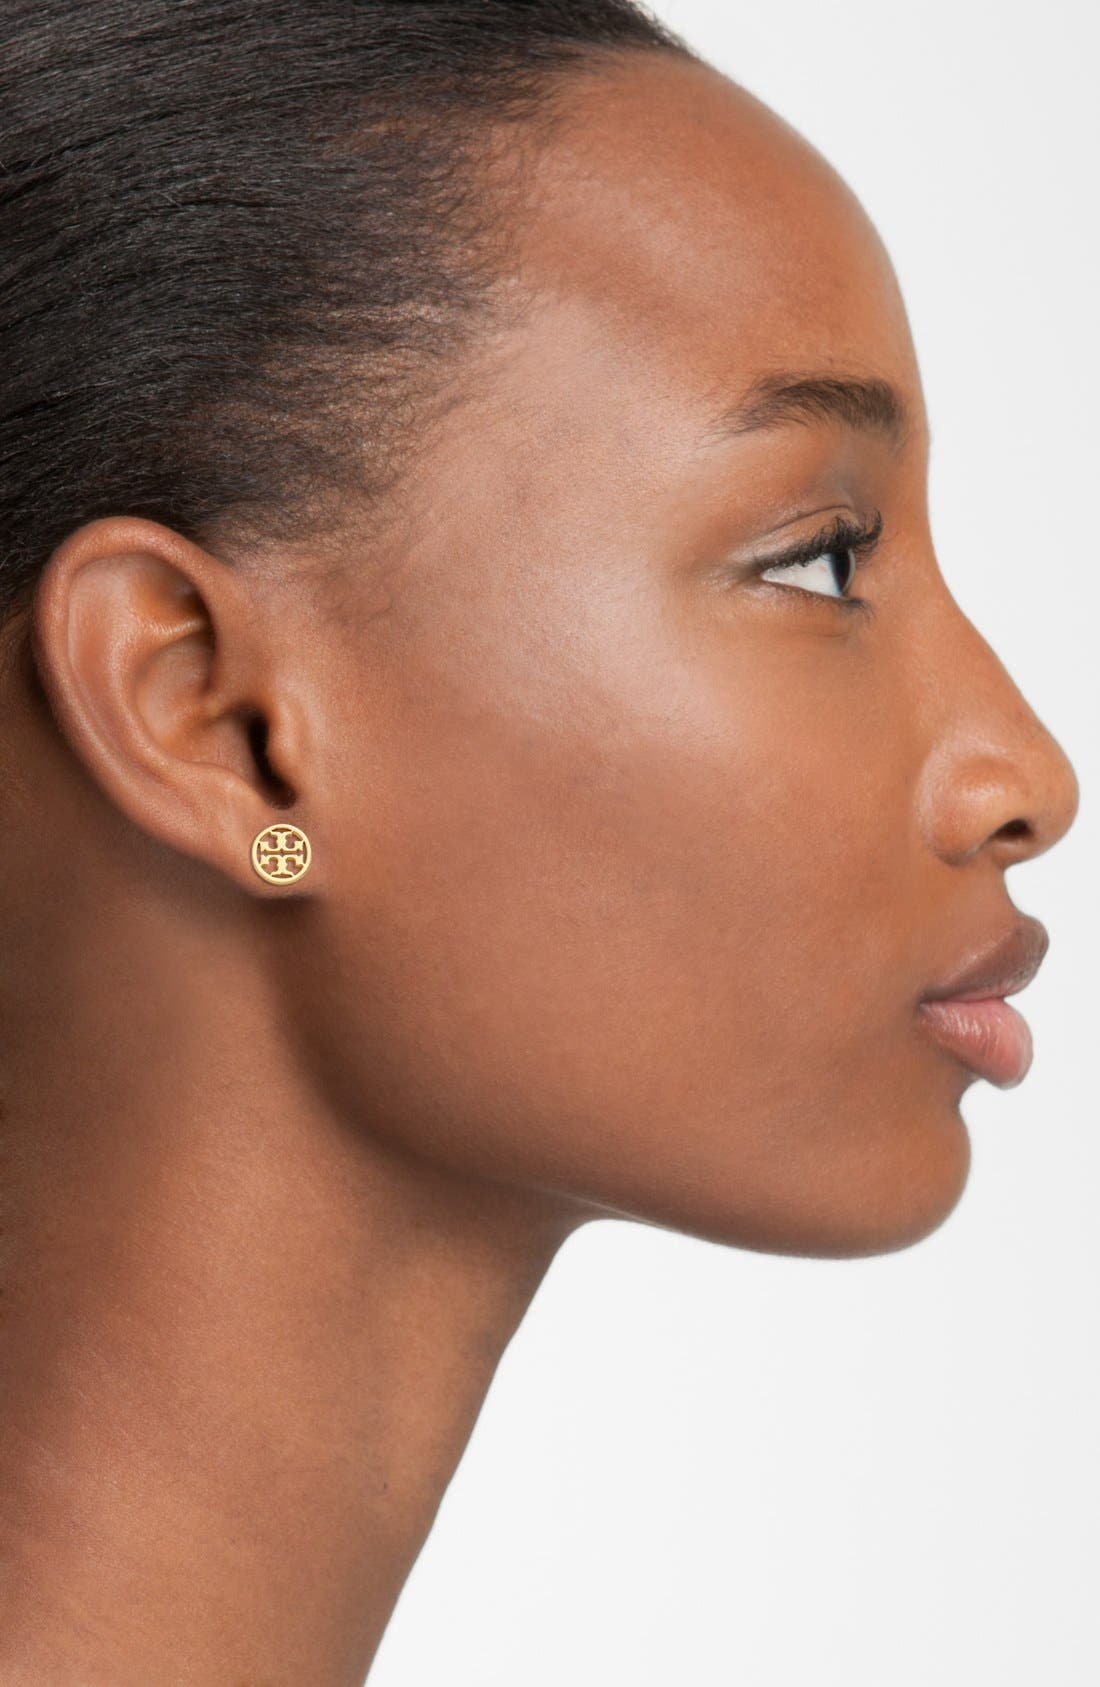 TORY BURCH, Circle Logo Stud Earrings, Alternate thumbnail 3, color, TORY GOLD